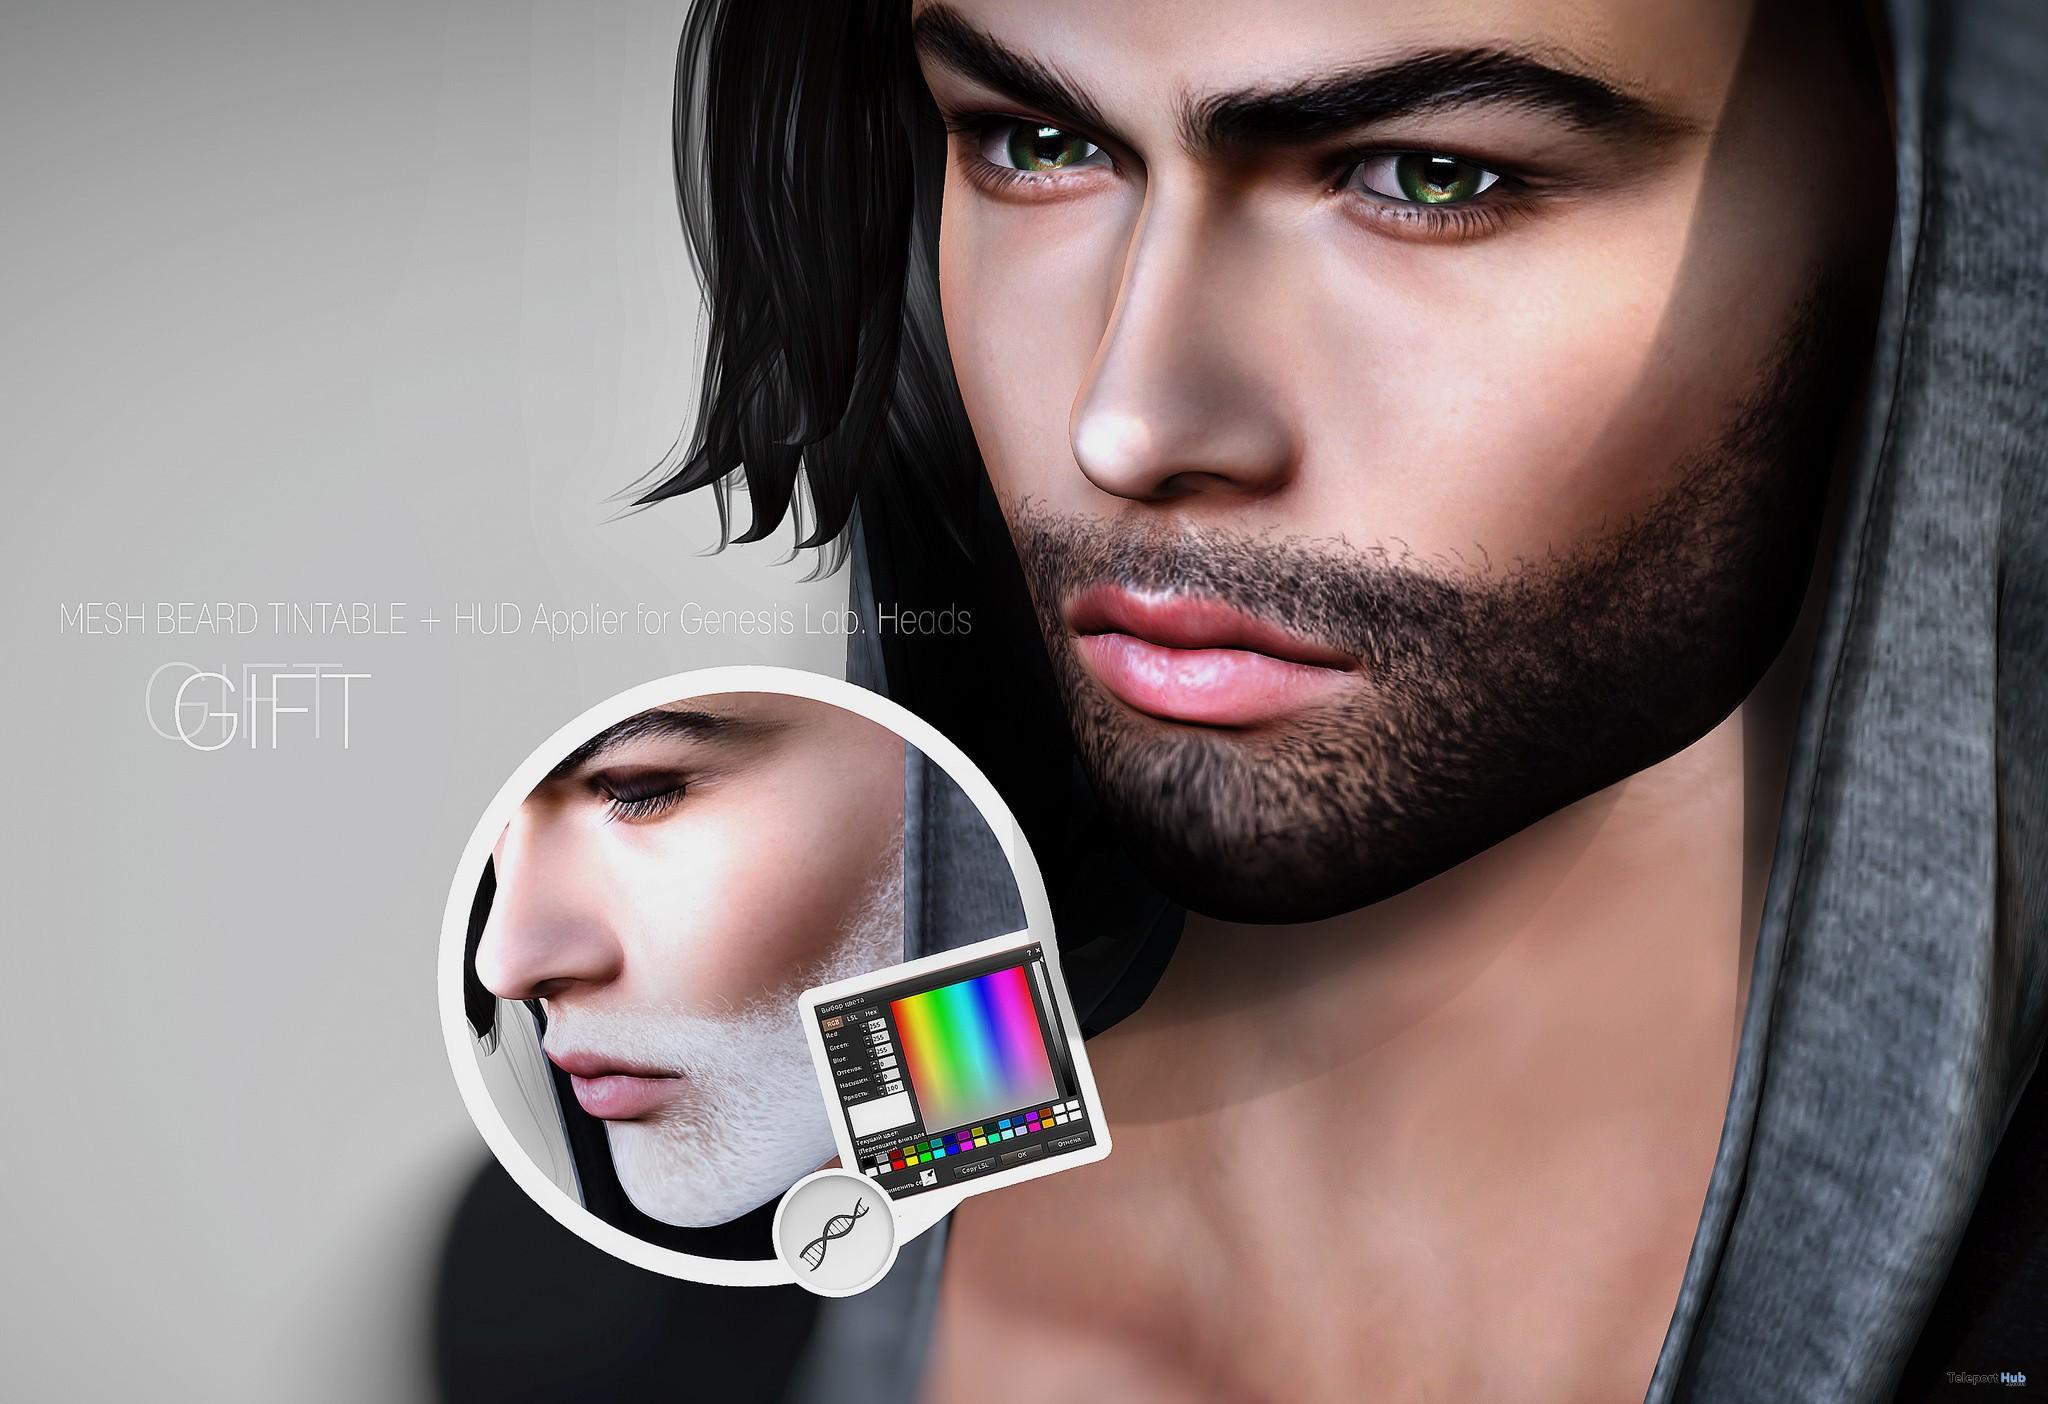 Mesh Tintable Beard Modify HUD October 2016 Shiny Shabby Gift by Genesis Lab - Teleport Hub - teleporthub.com